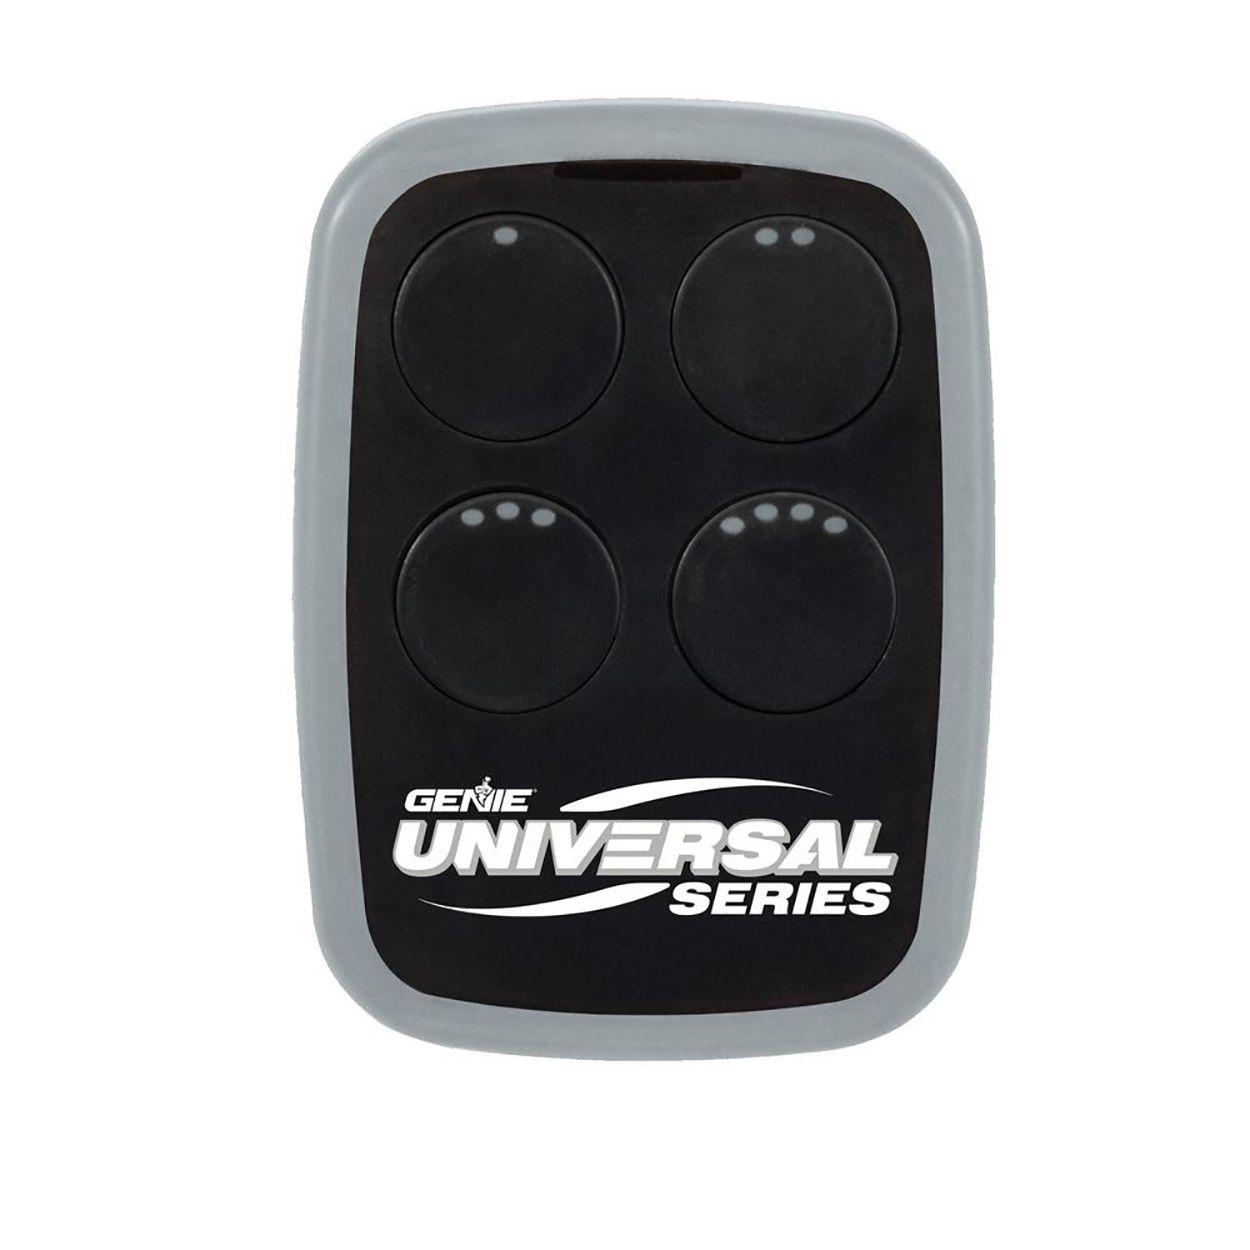 The Genie Universal four-button garage door and gate opener remote